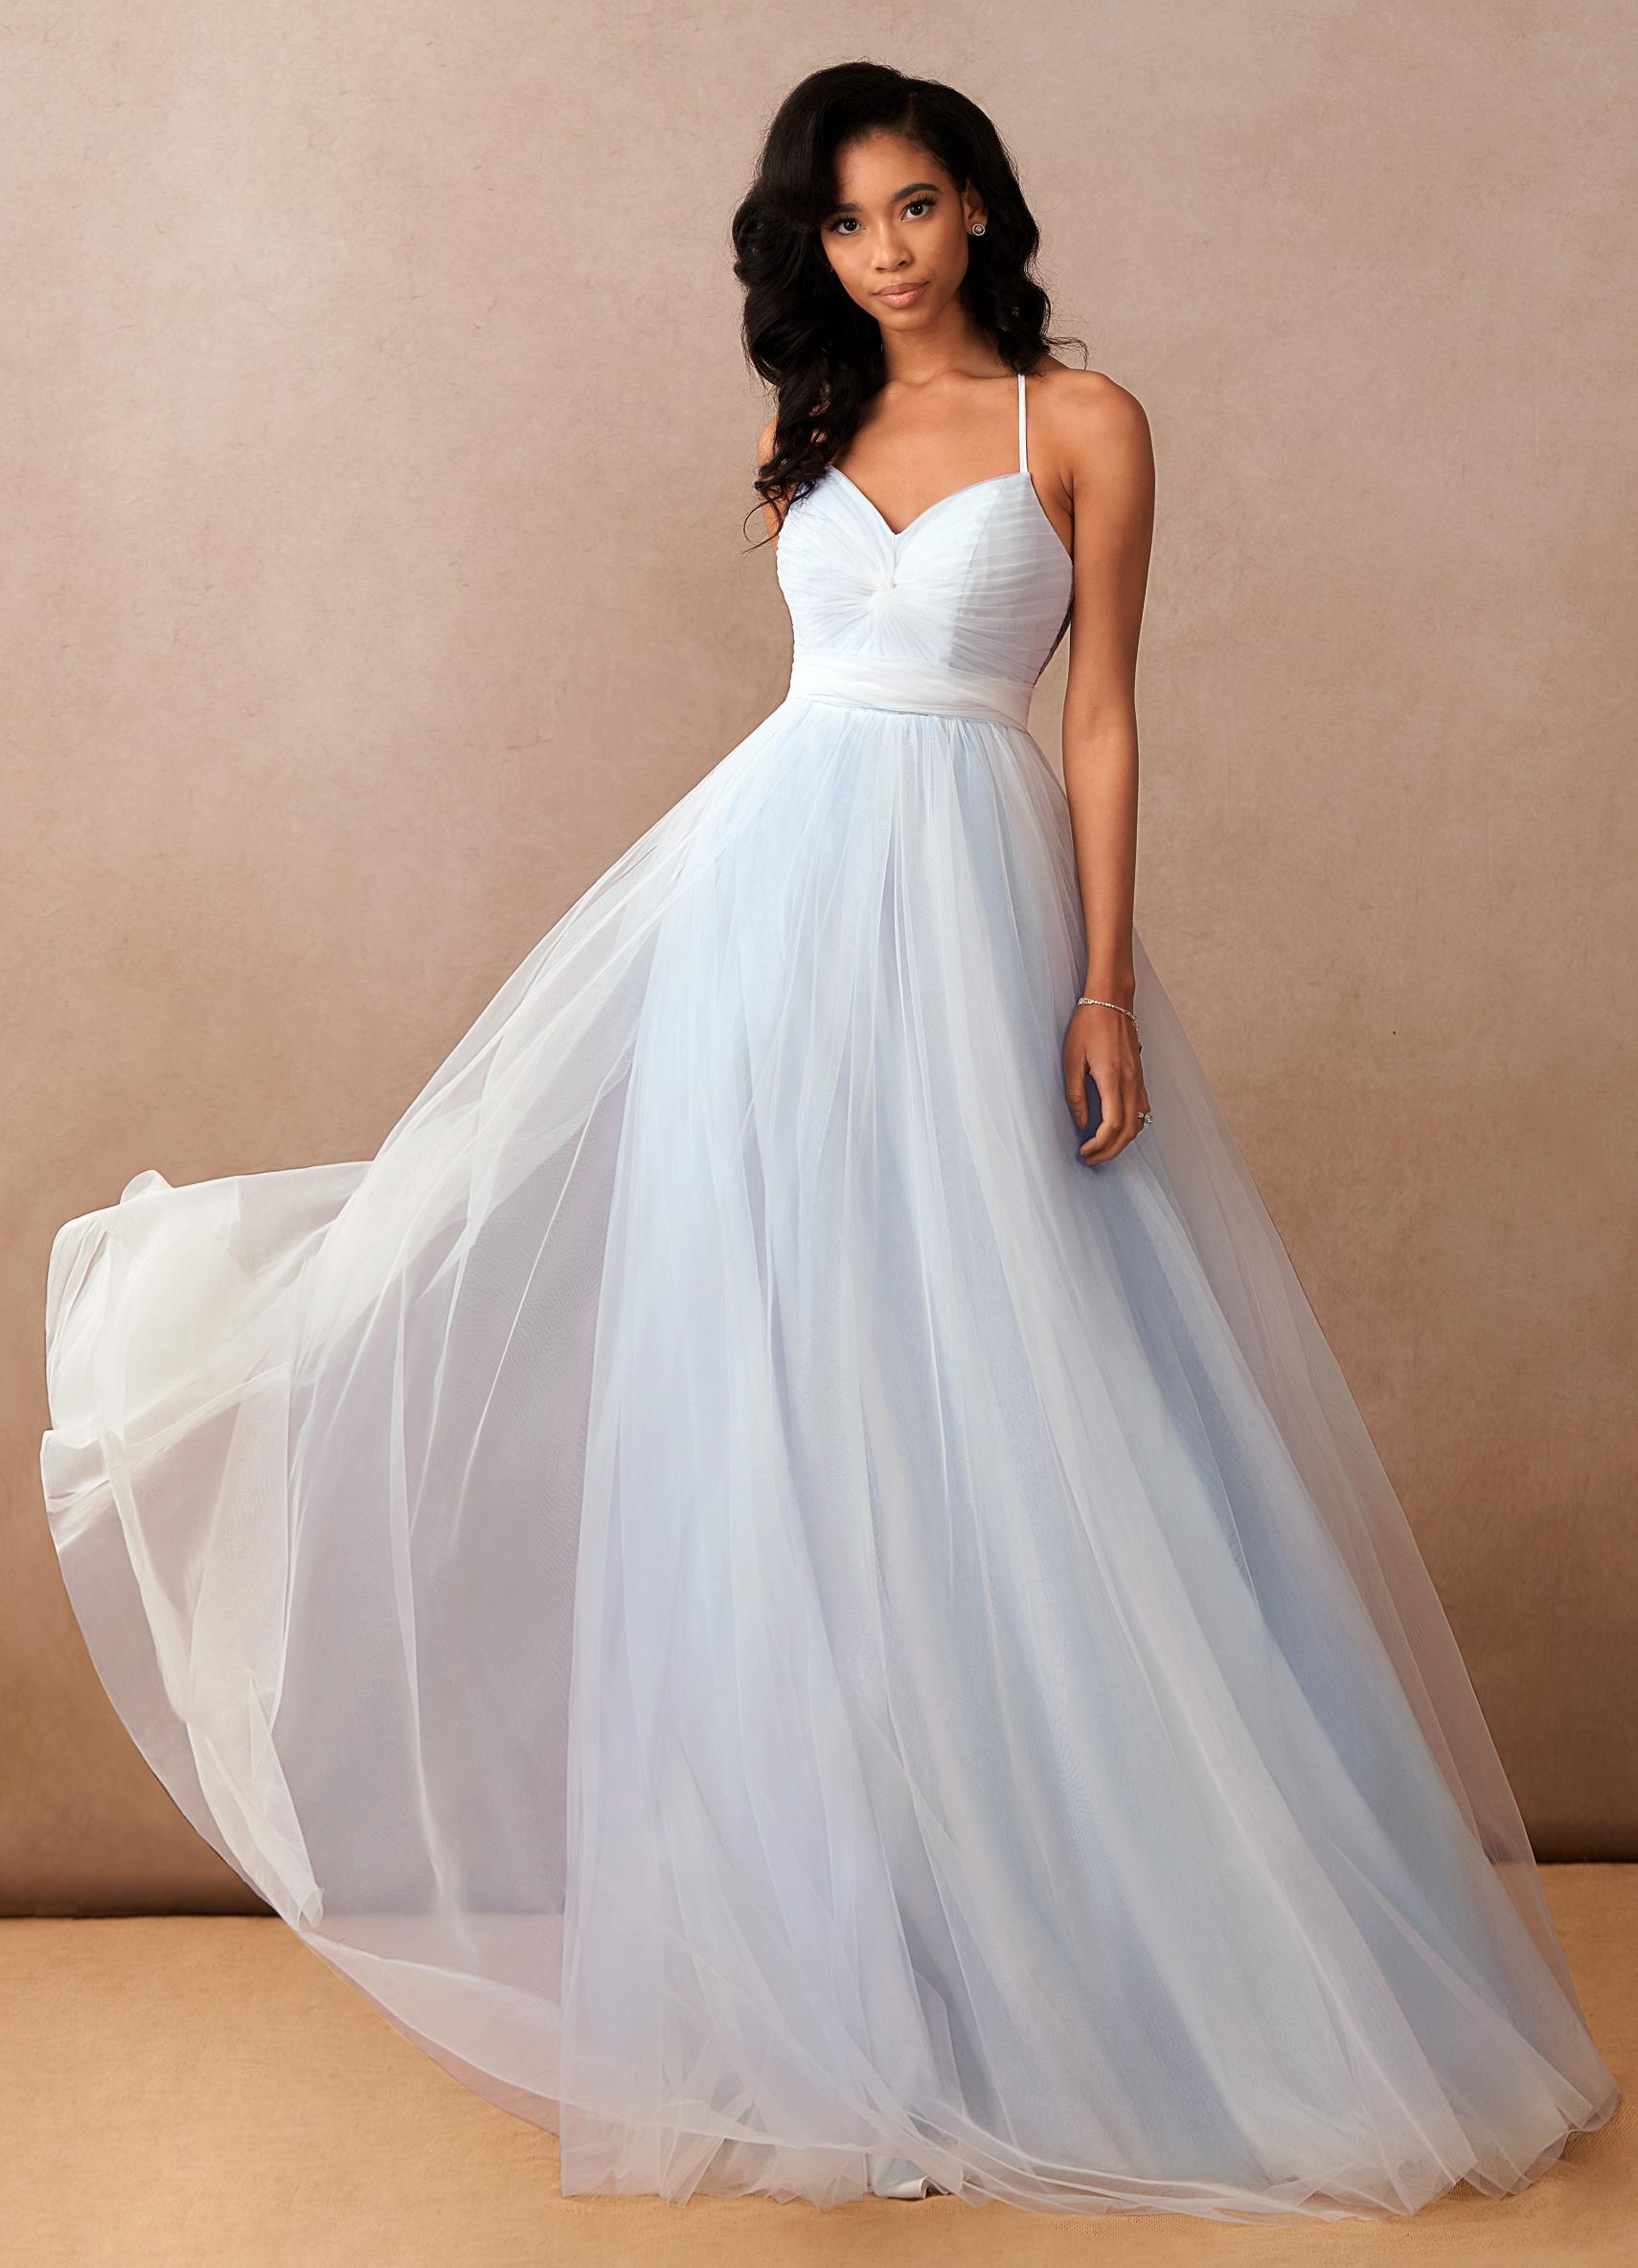 Azazie Aura, Azazie Essence, bridal gown. colored wedding dresses, light blue wedding dress, ballgown wedding dress, sleeveless wedding dress